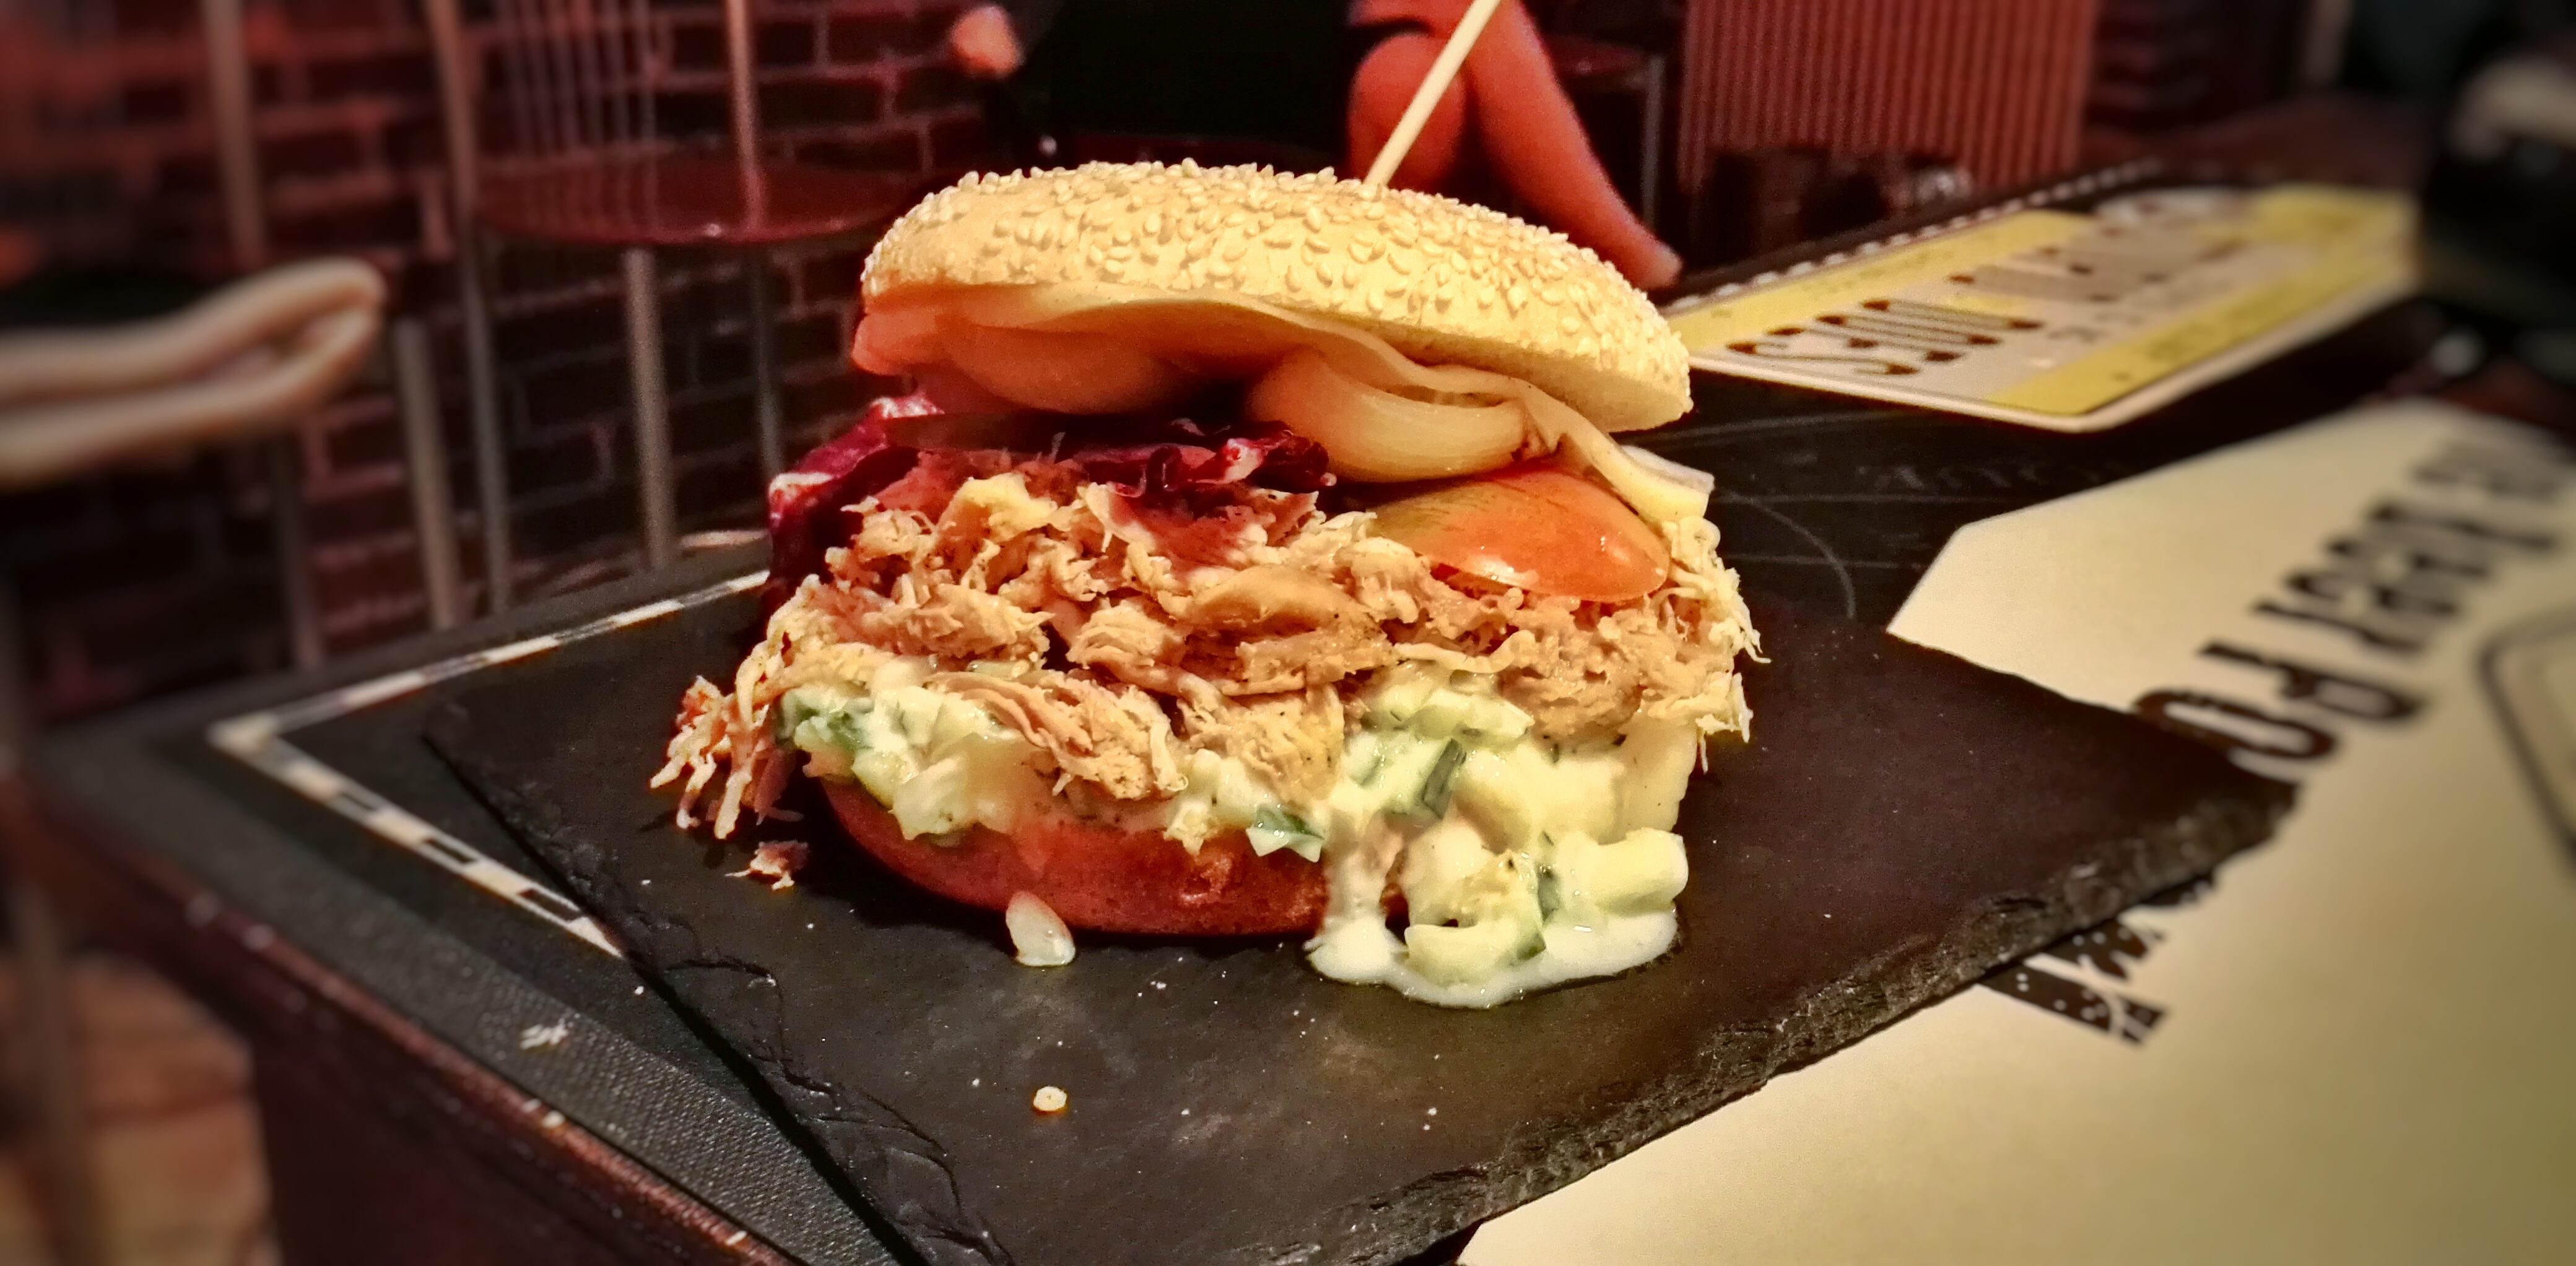 Pulled Pork Sandwich, THe White Flag Edtion